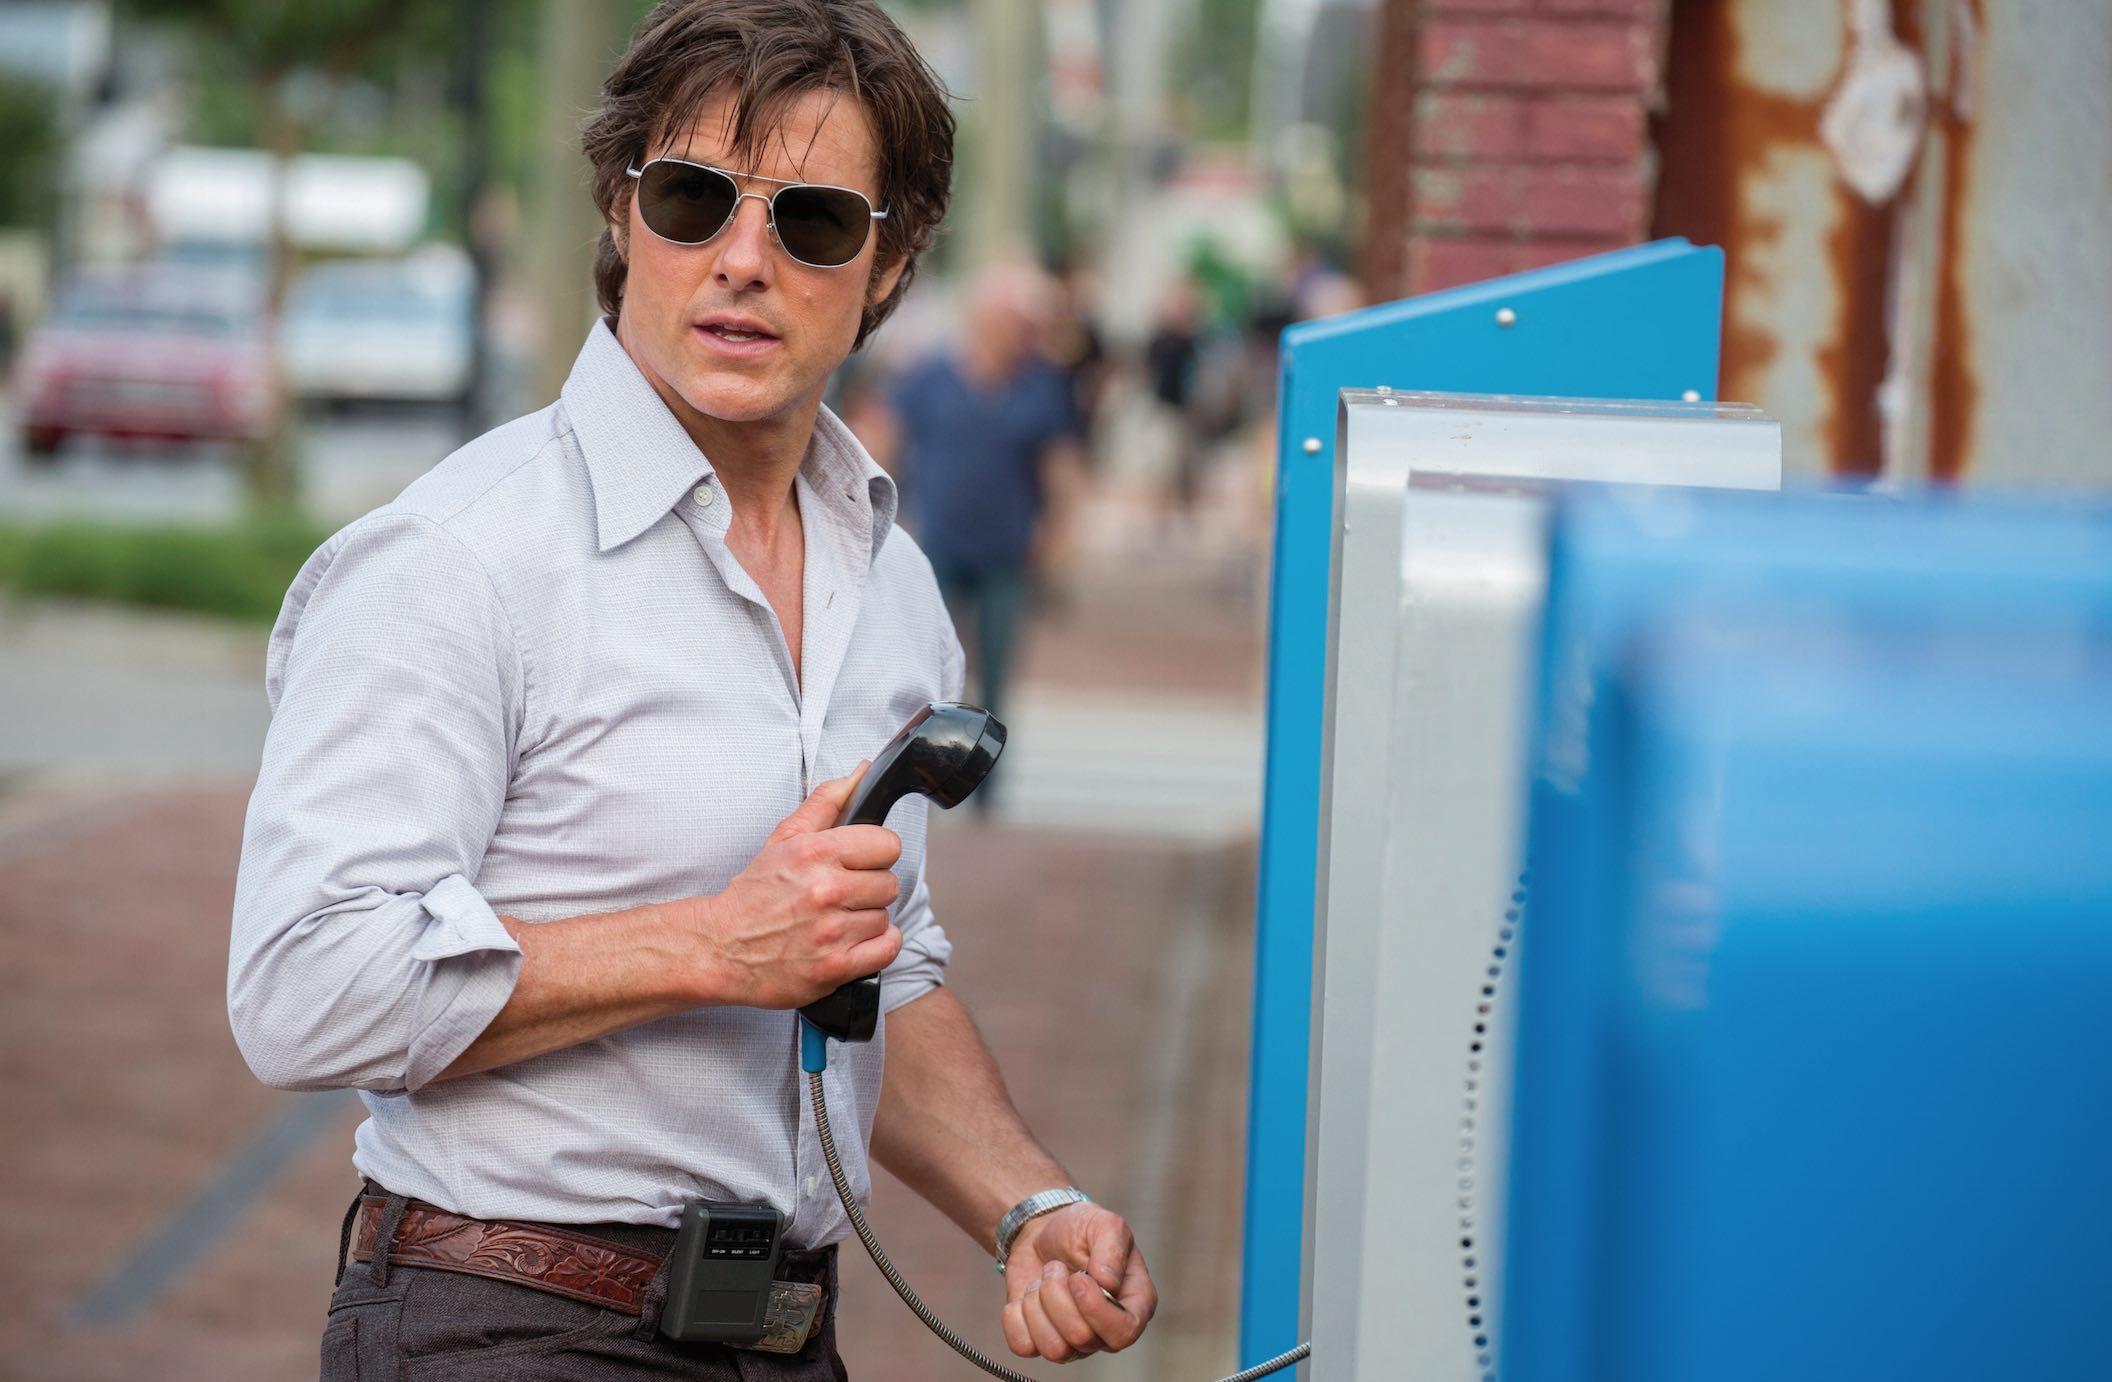 Tom Cruise David James photo